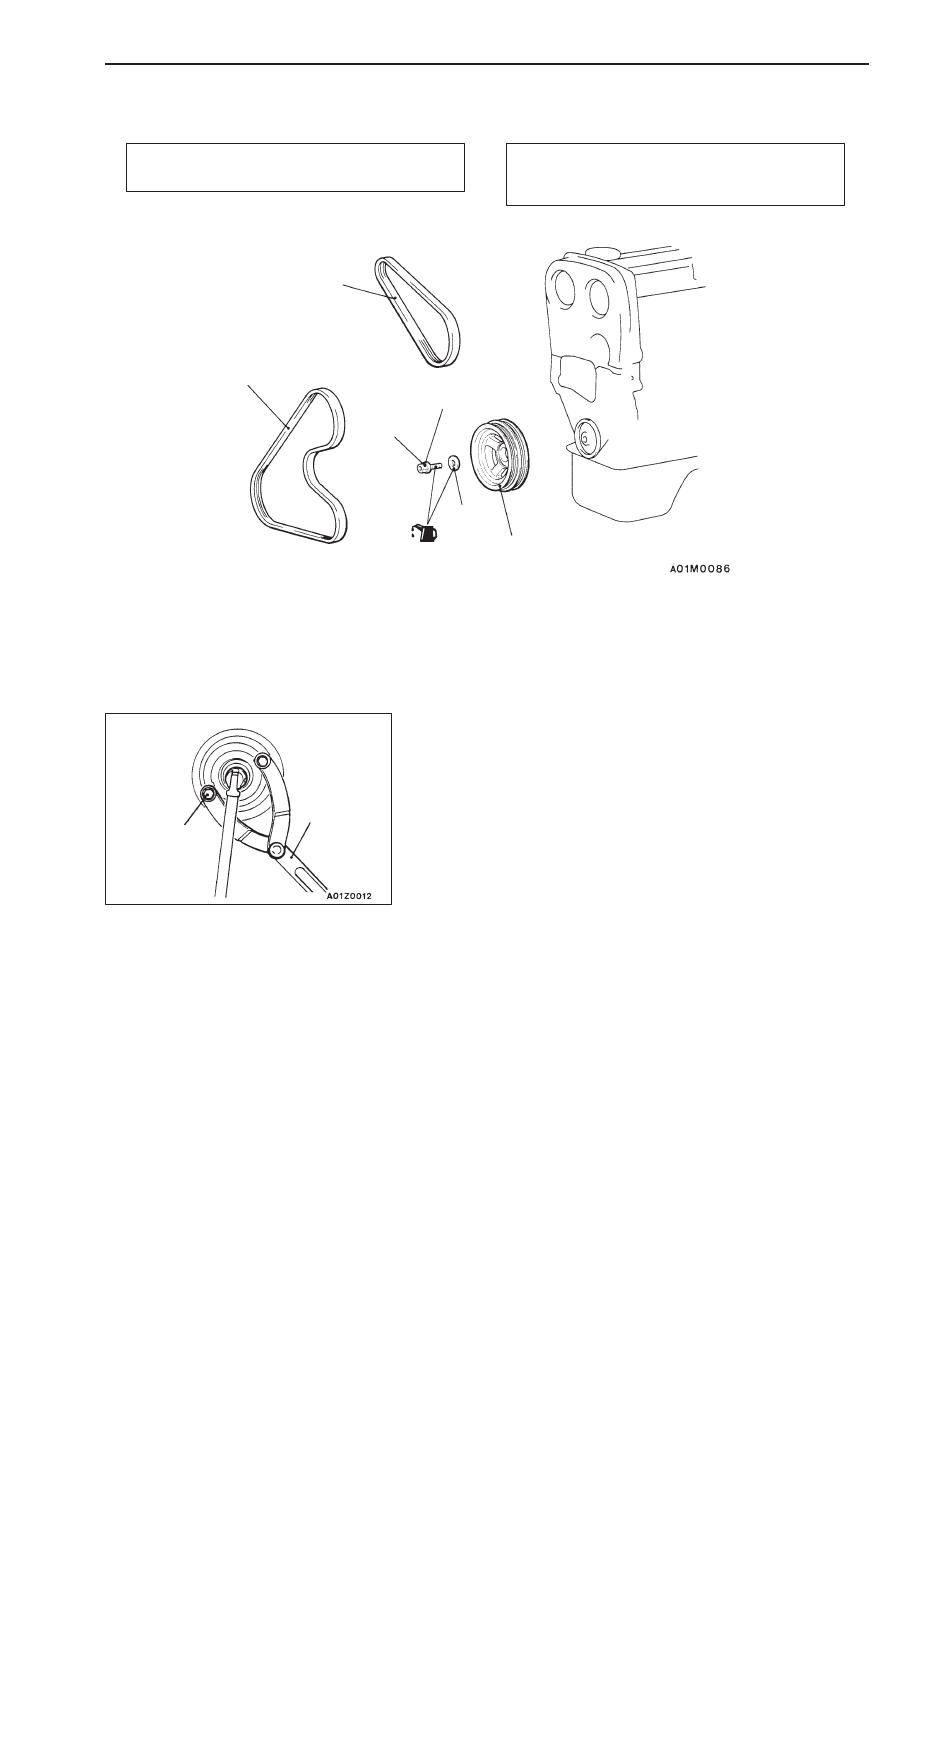 mitsubishi pajero pinin manual part 14 rh zinref ru